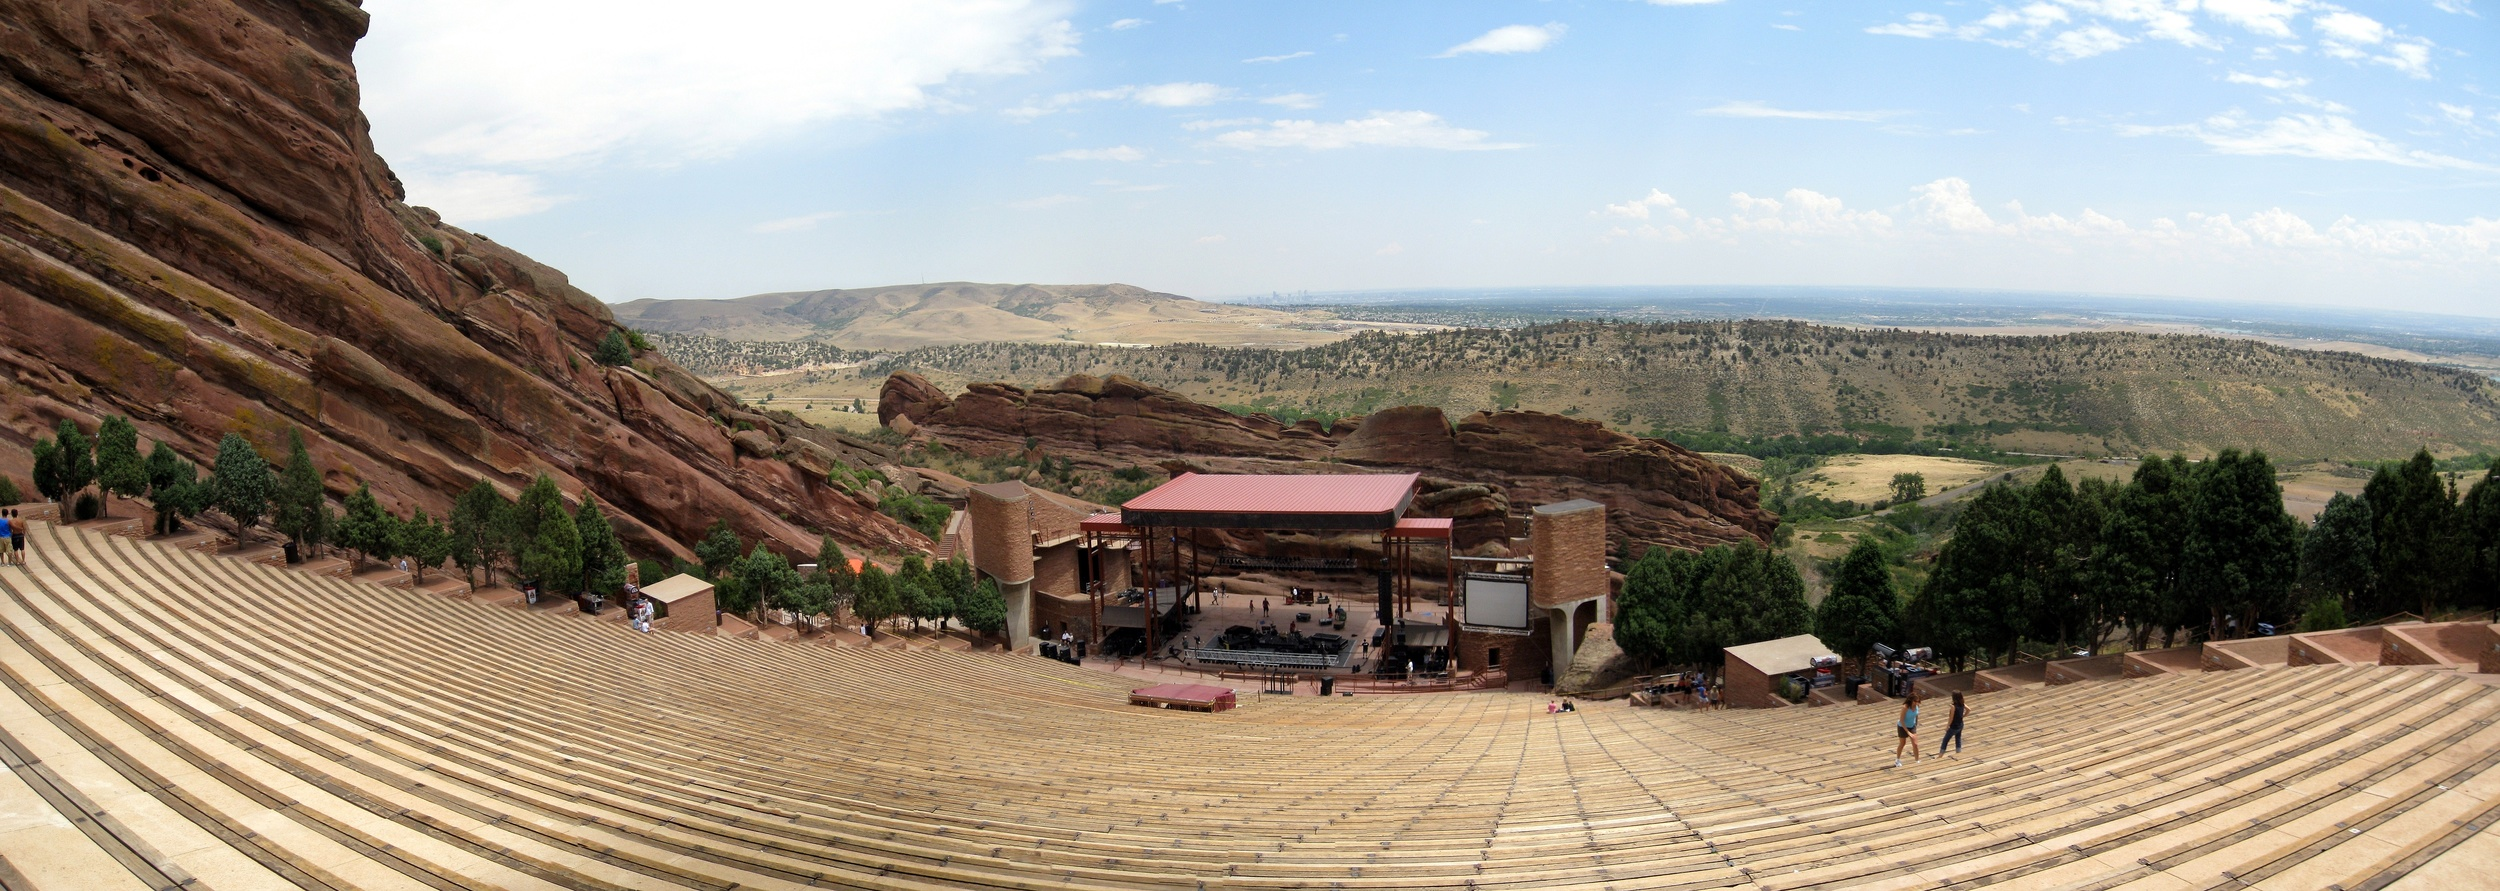 Red Rocks Amphitheater just outside of Denver